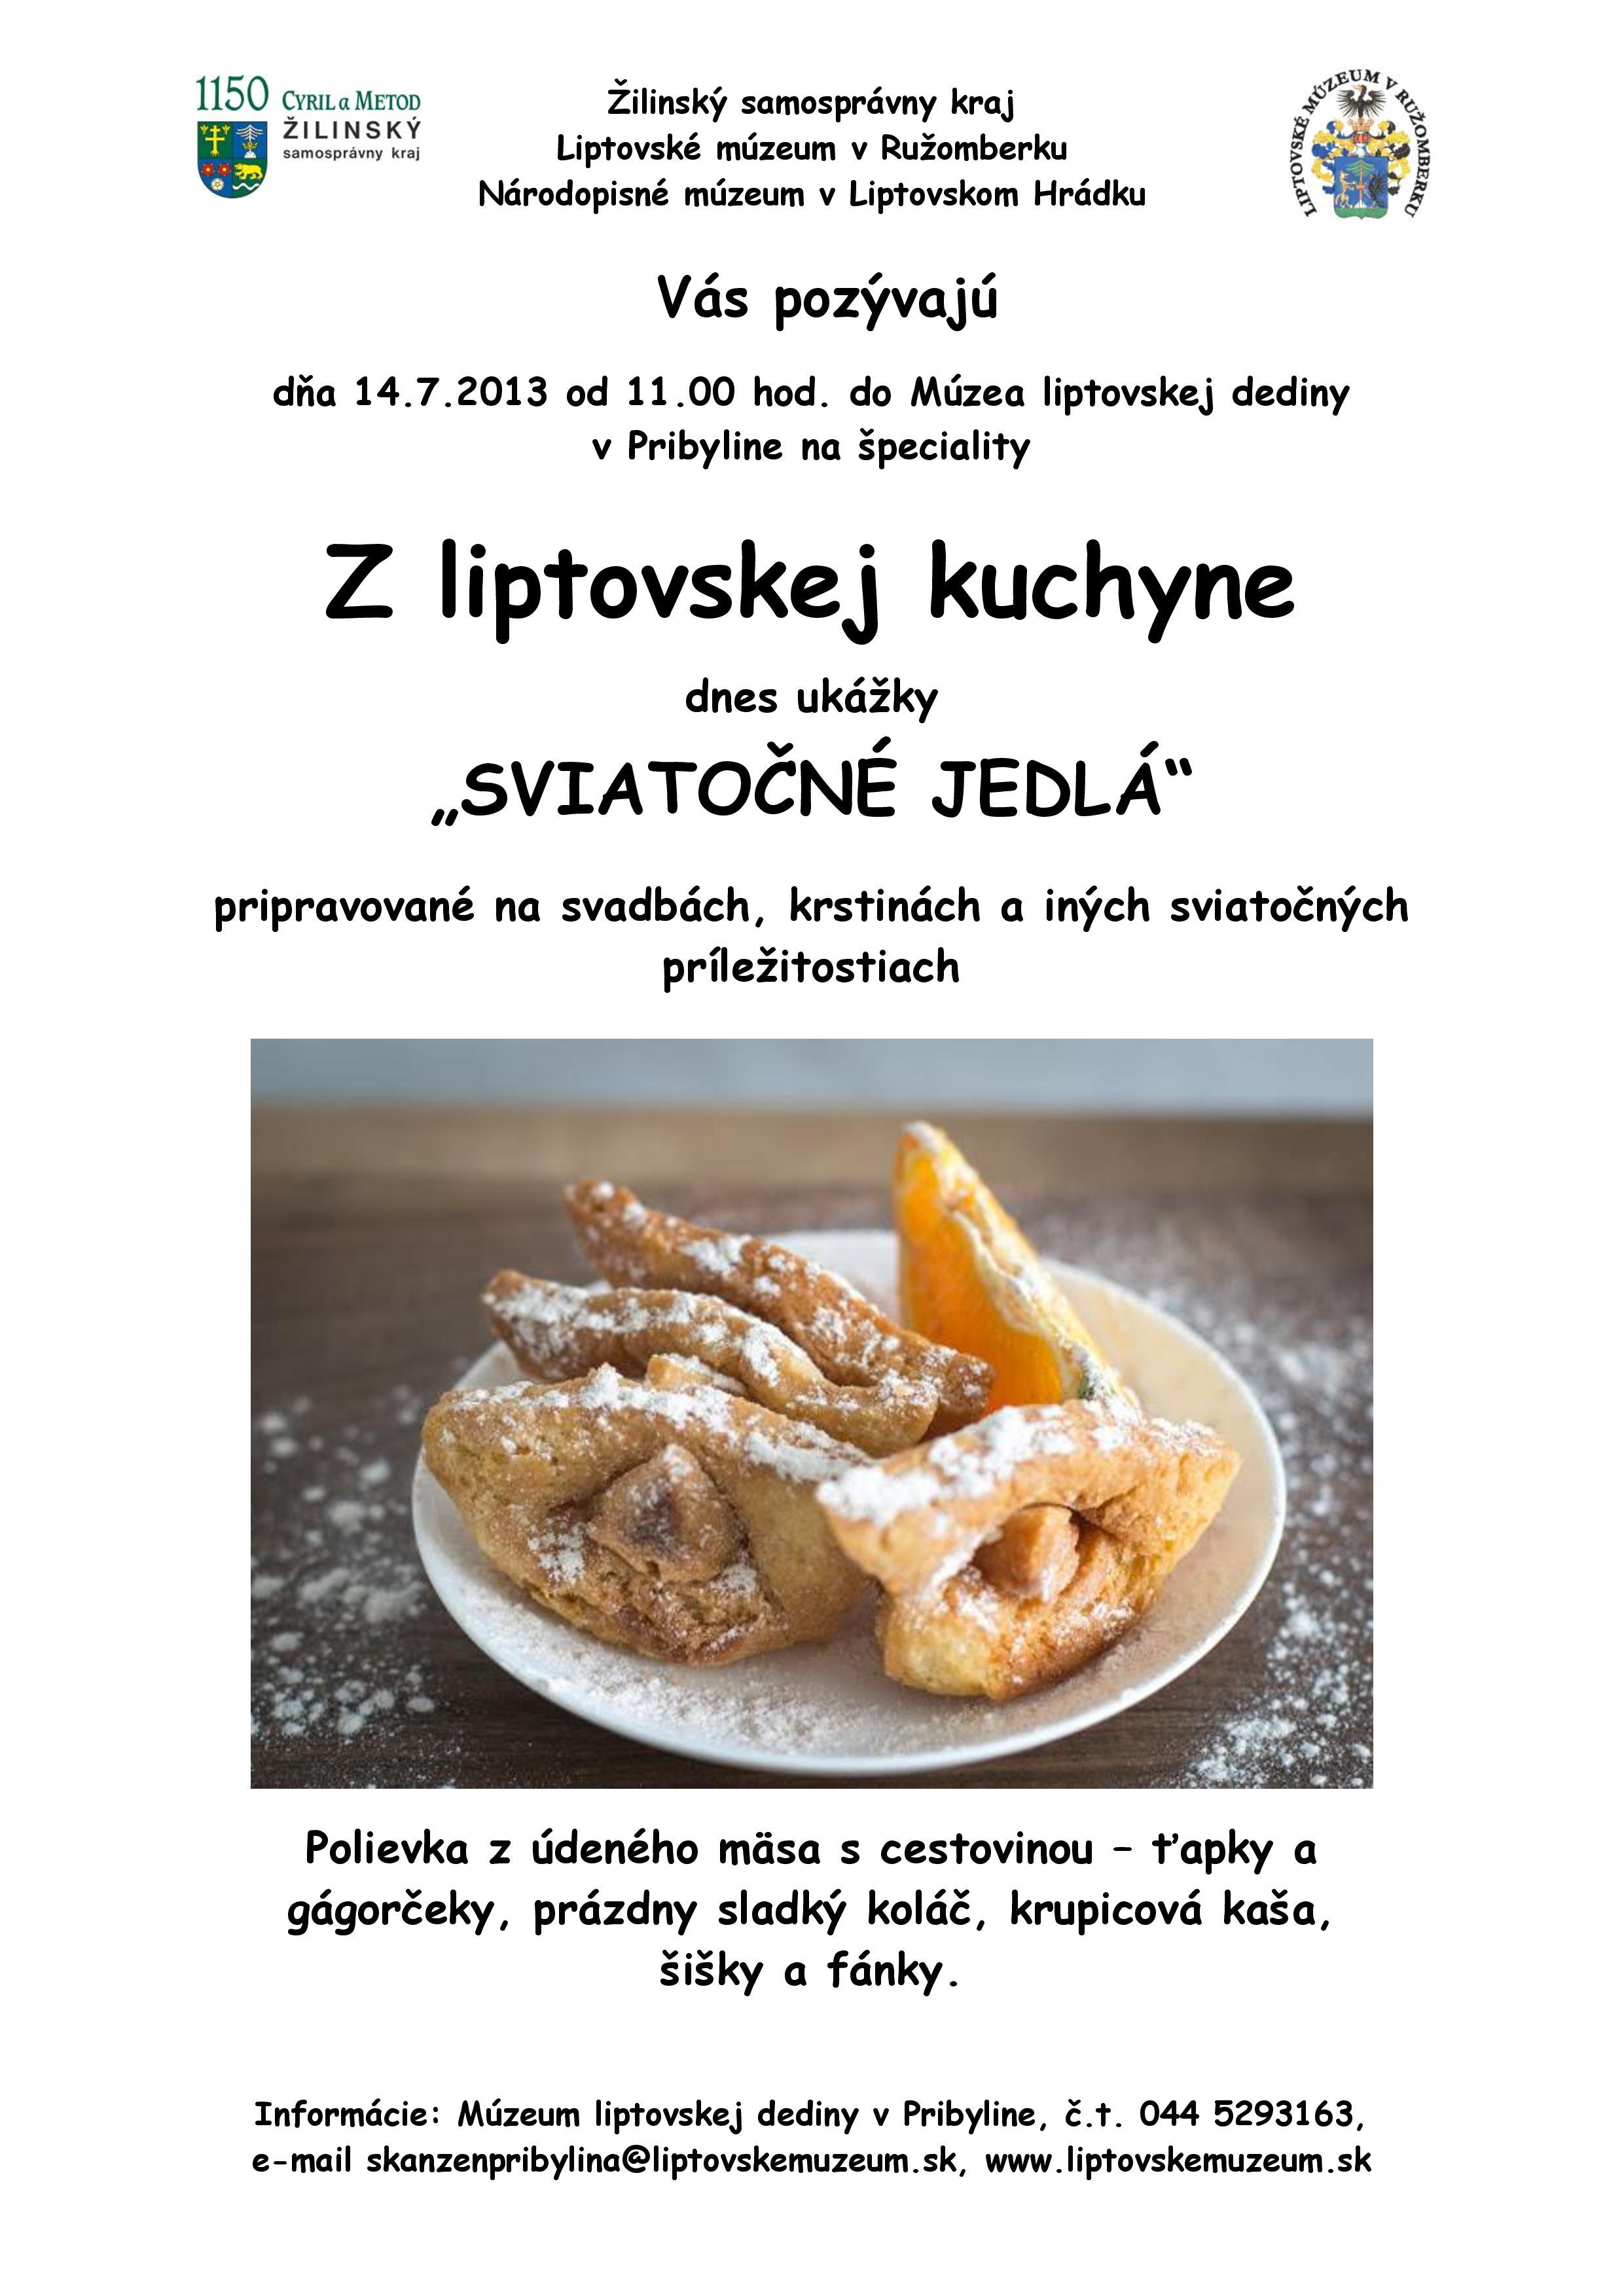 z-liptovskej-kuchyne-sviatocne-jedla-2013